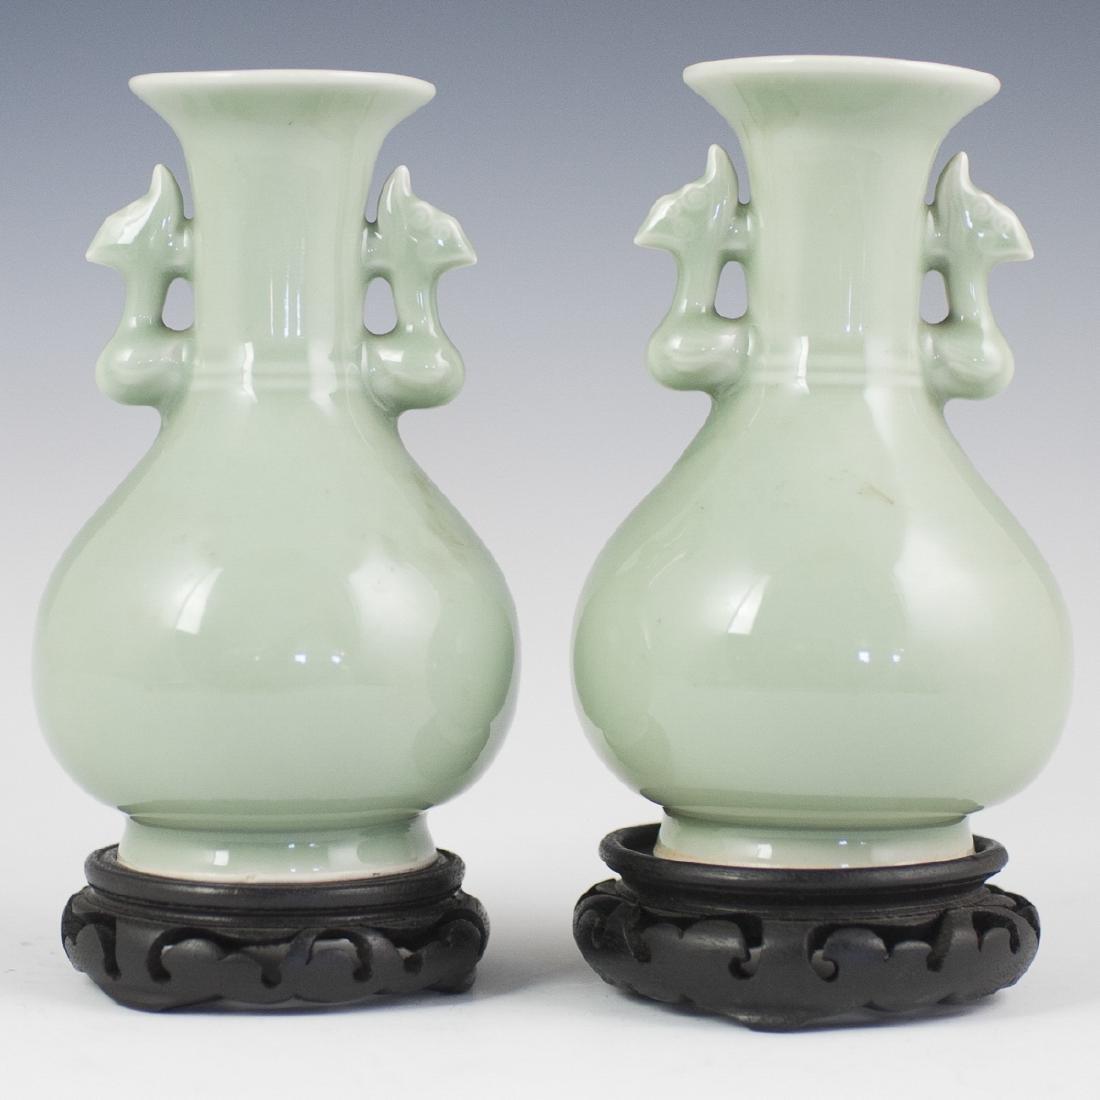 Chinese Celadon Vases